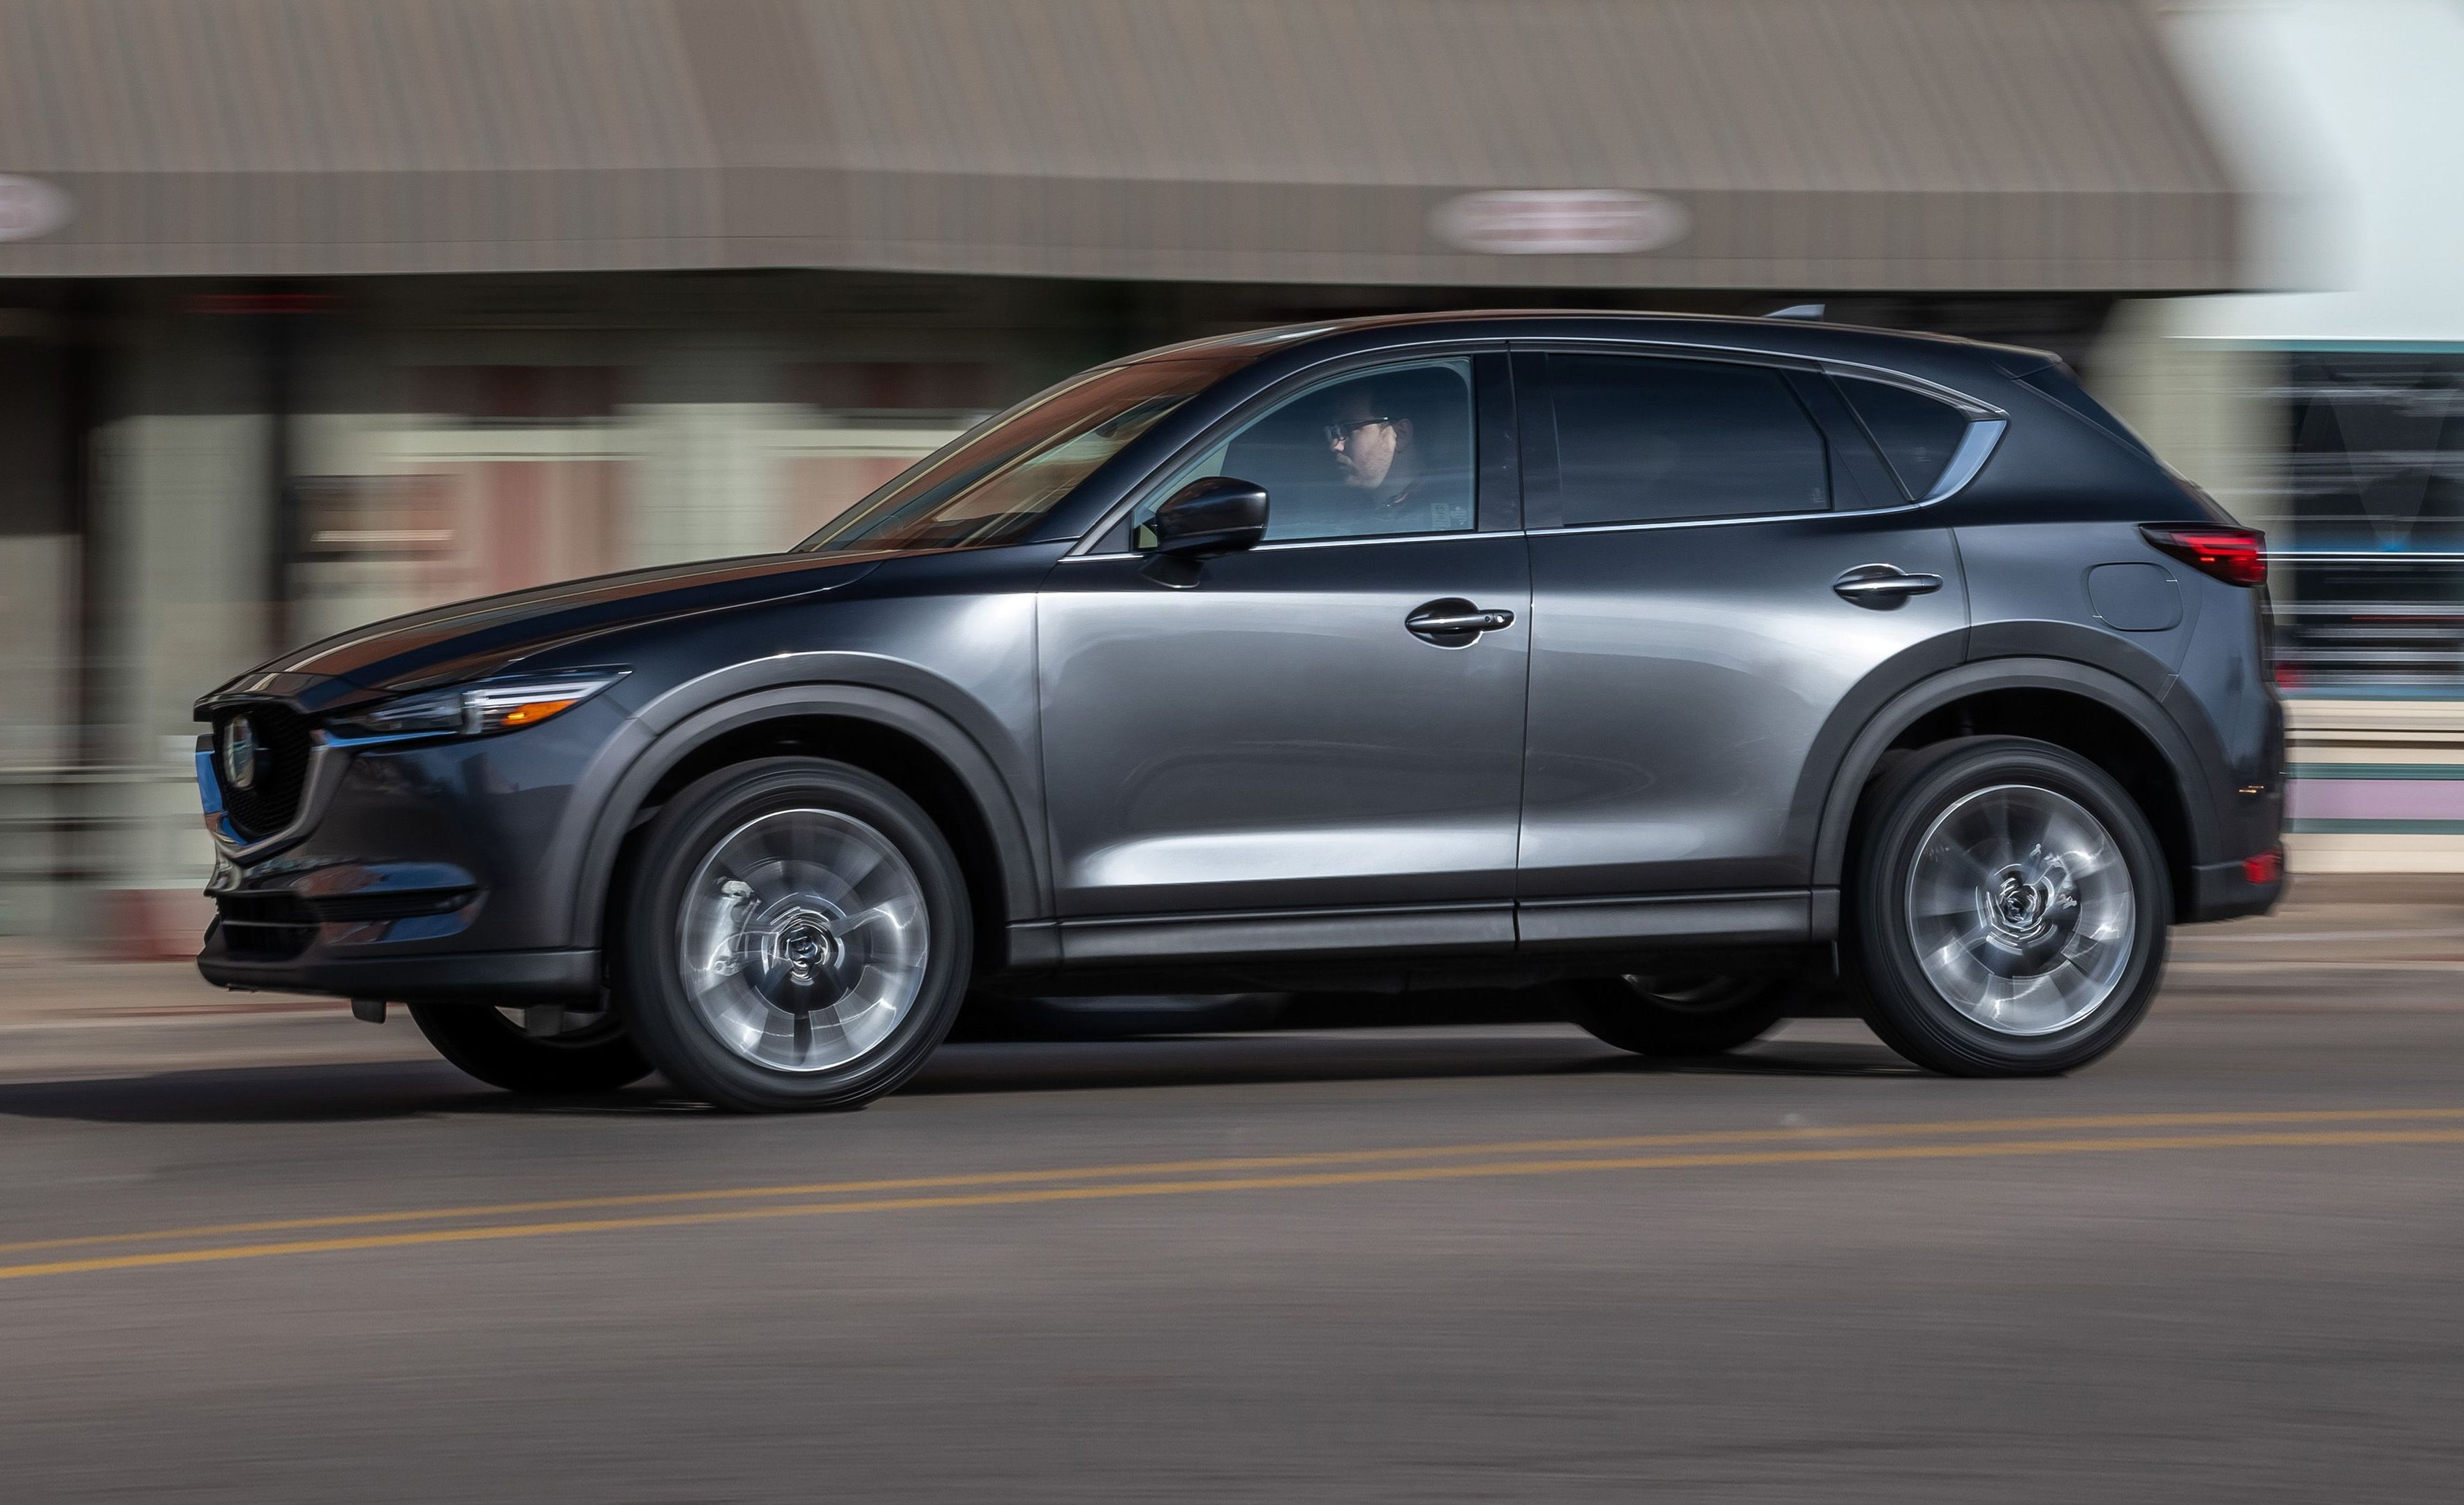 2019 Mazda Cx 5 2 5t Signature A Luxurious Turbo Suv